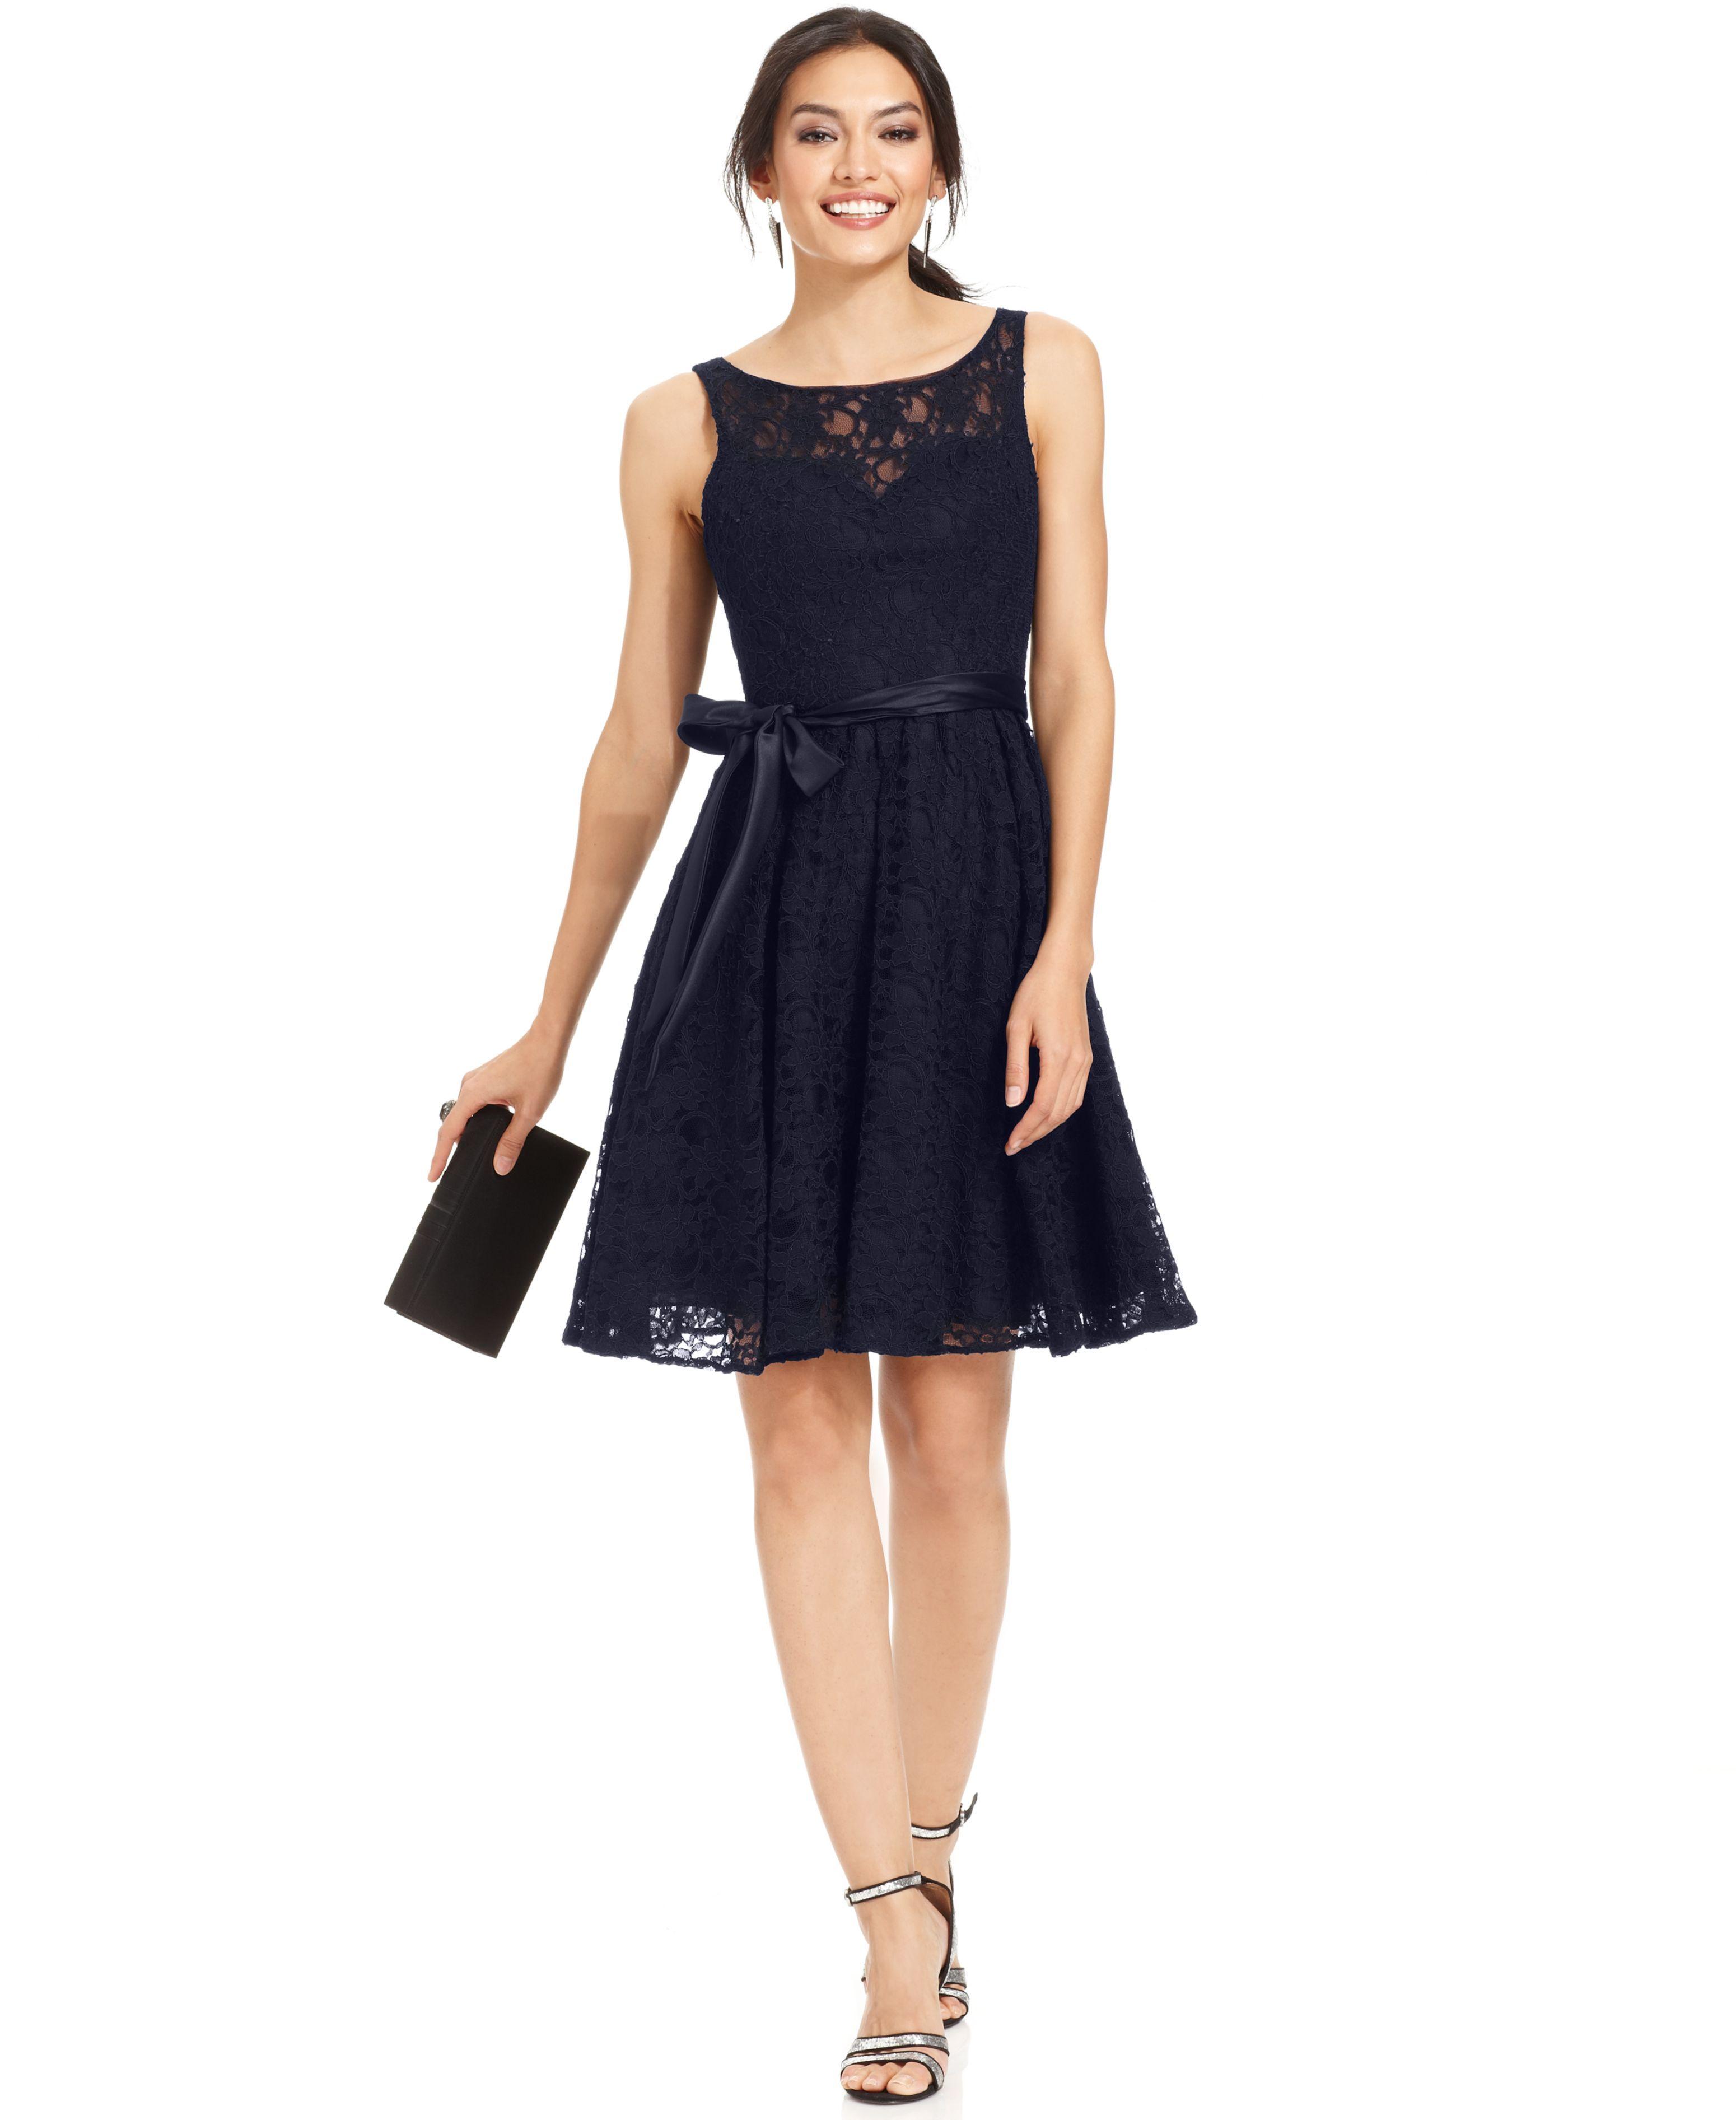 59dd46bc19 Black Bridesmaid Dresses Macys - Data Dynamic AG